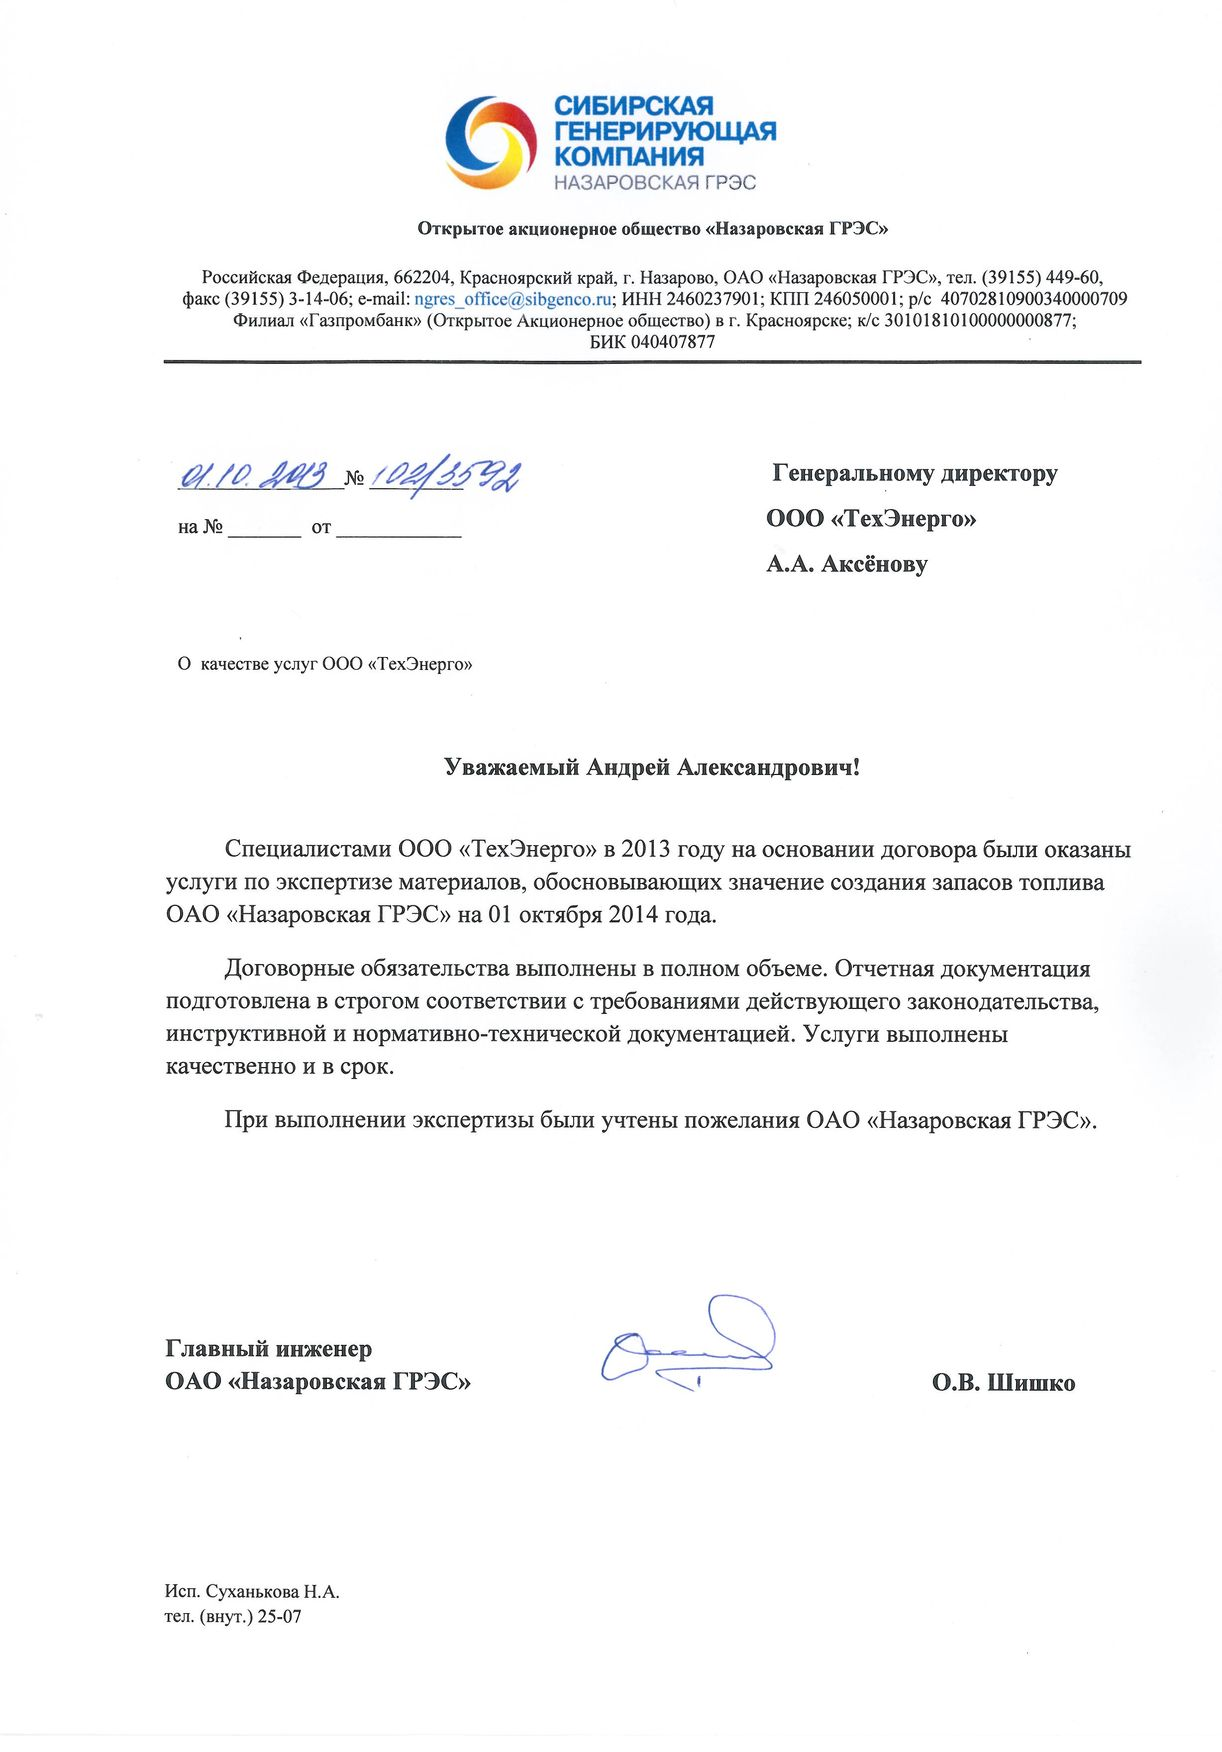 НГРЭС экспертиза 2013.jpg